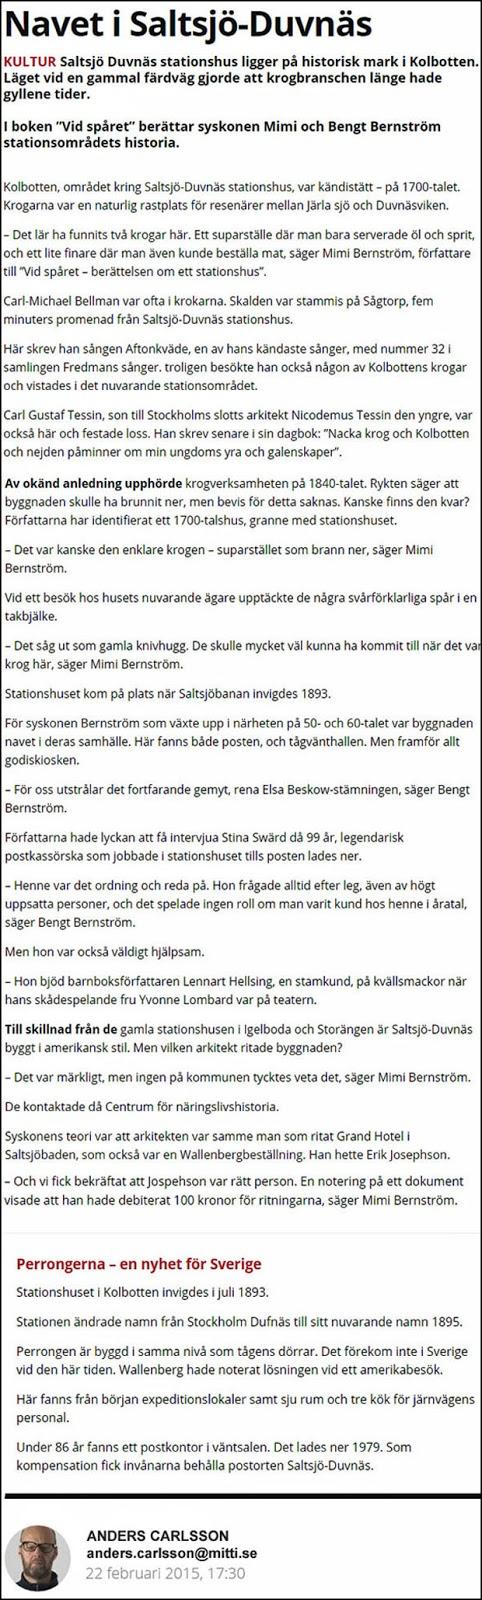 Saltsjö-Duvnäs.